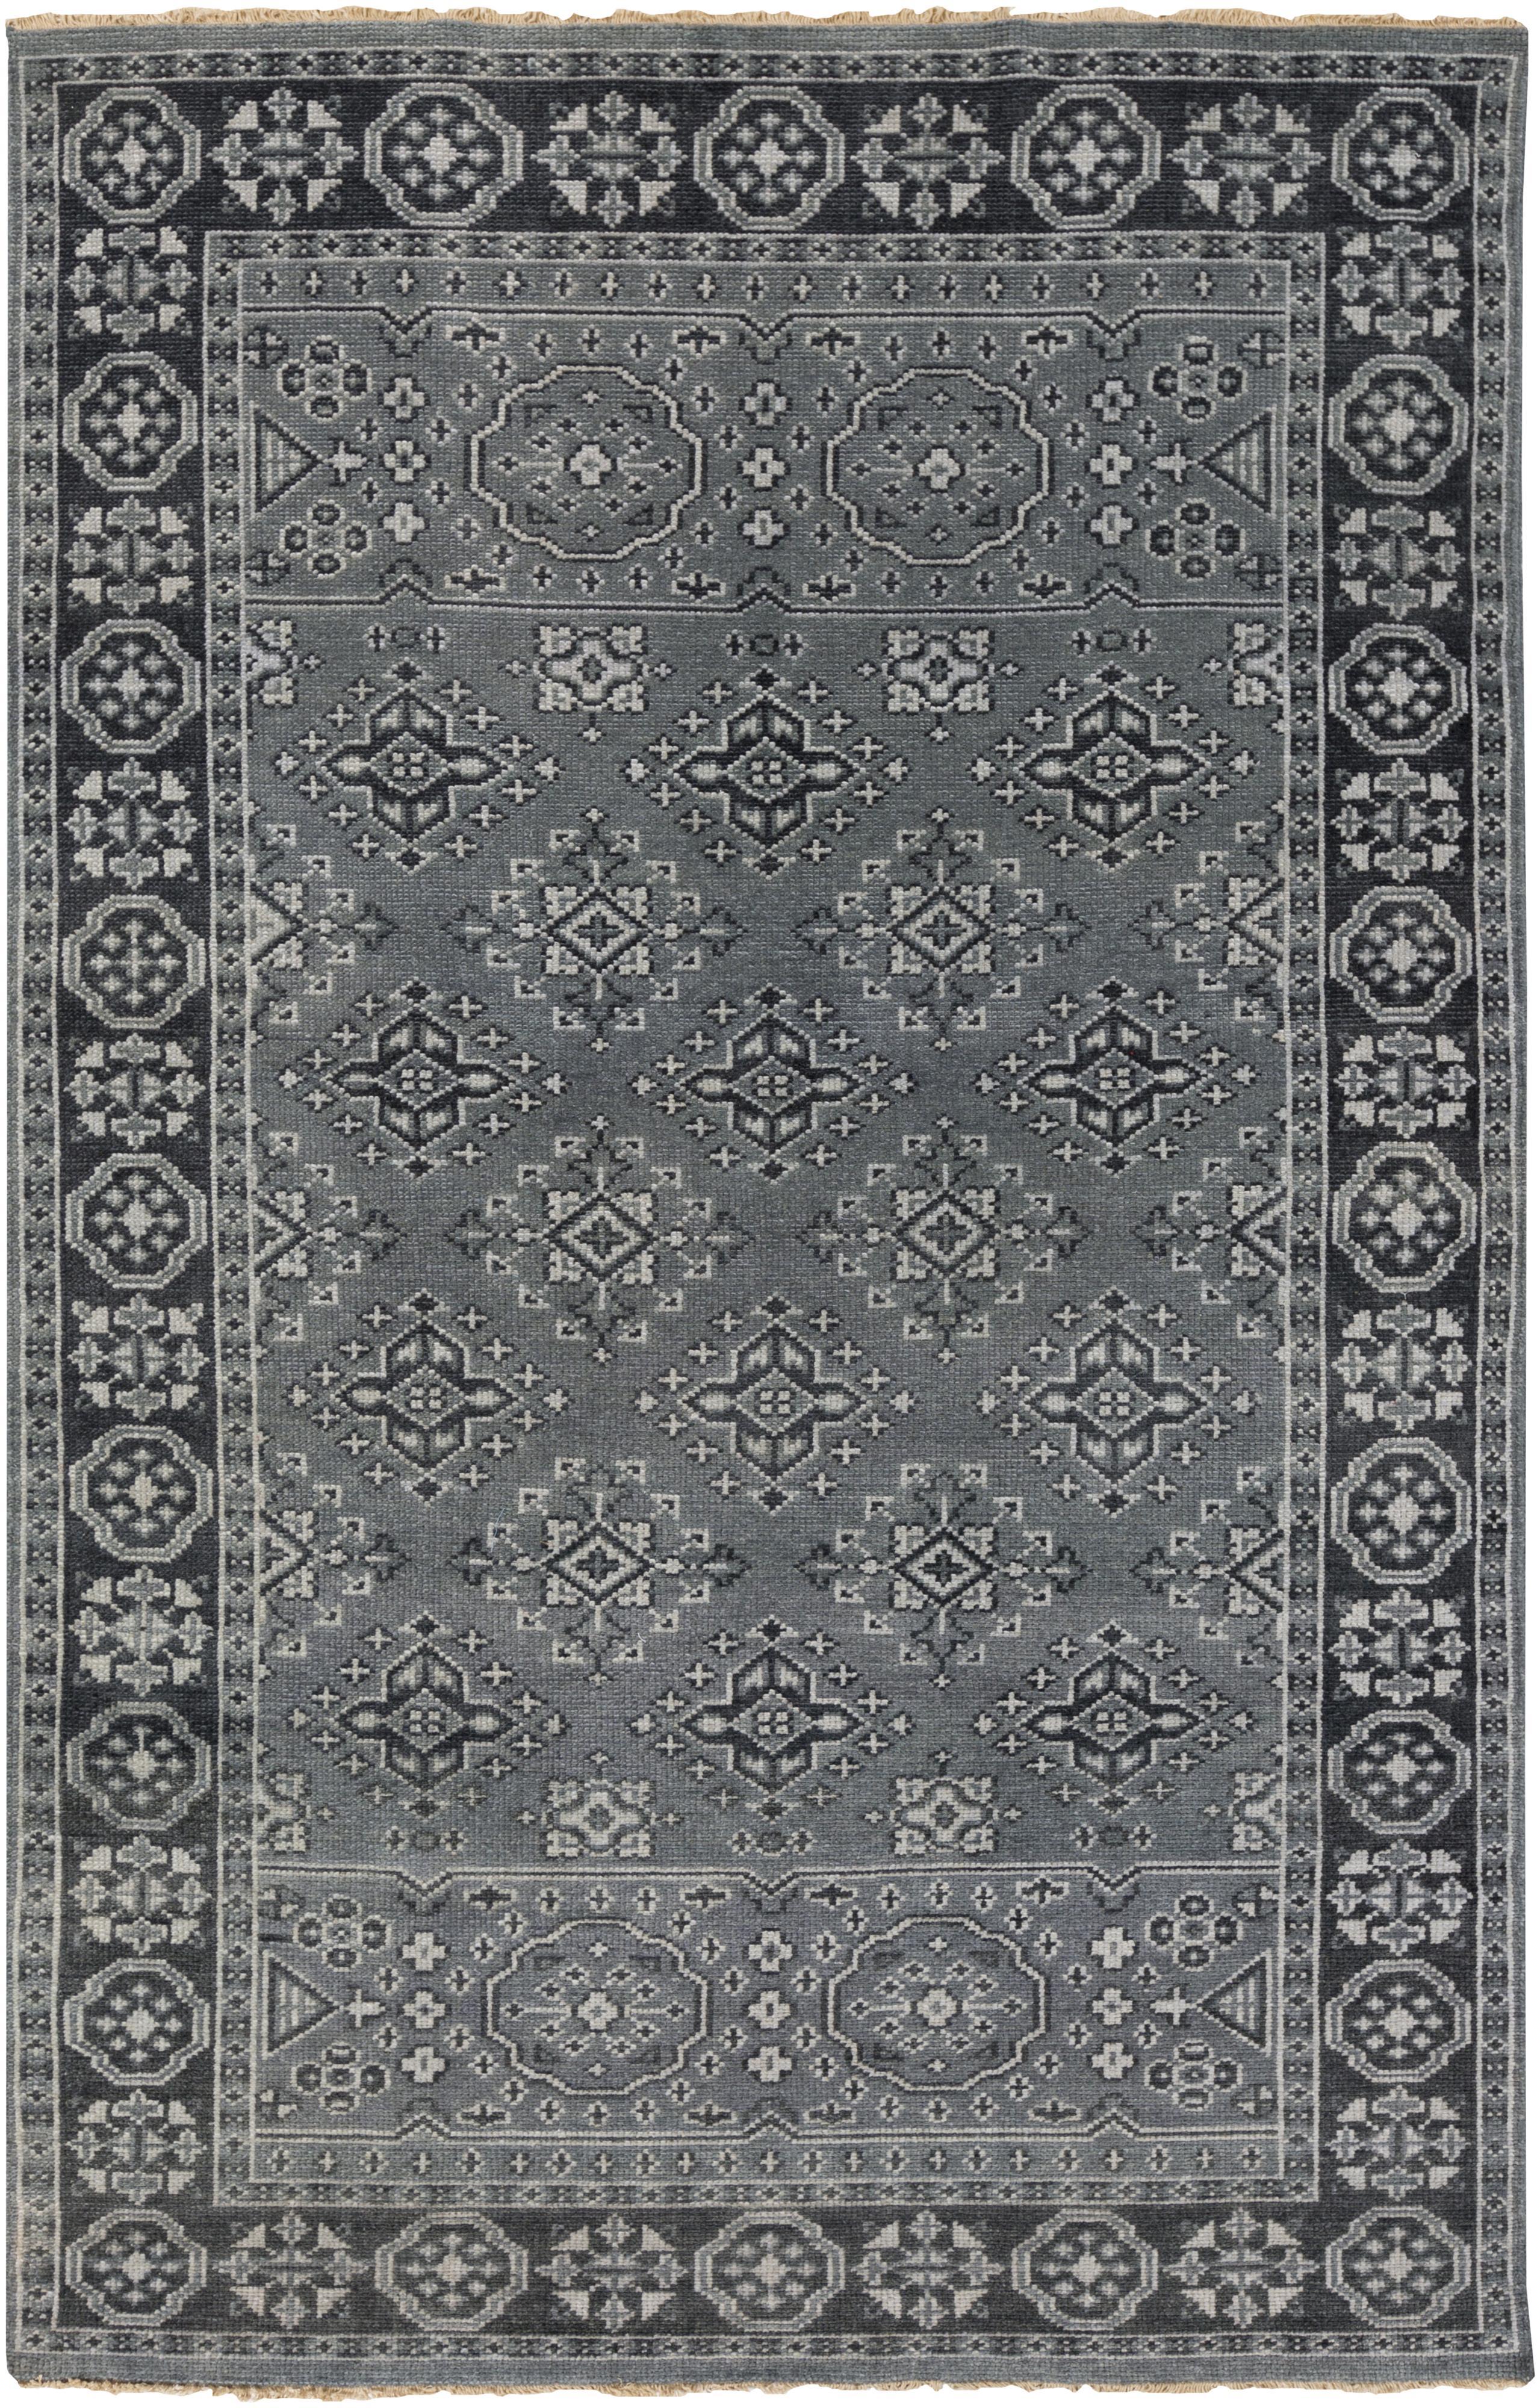 Cappadocia 9' x 13' by 9596 at Becker Furniture